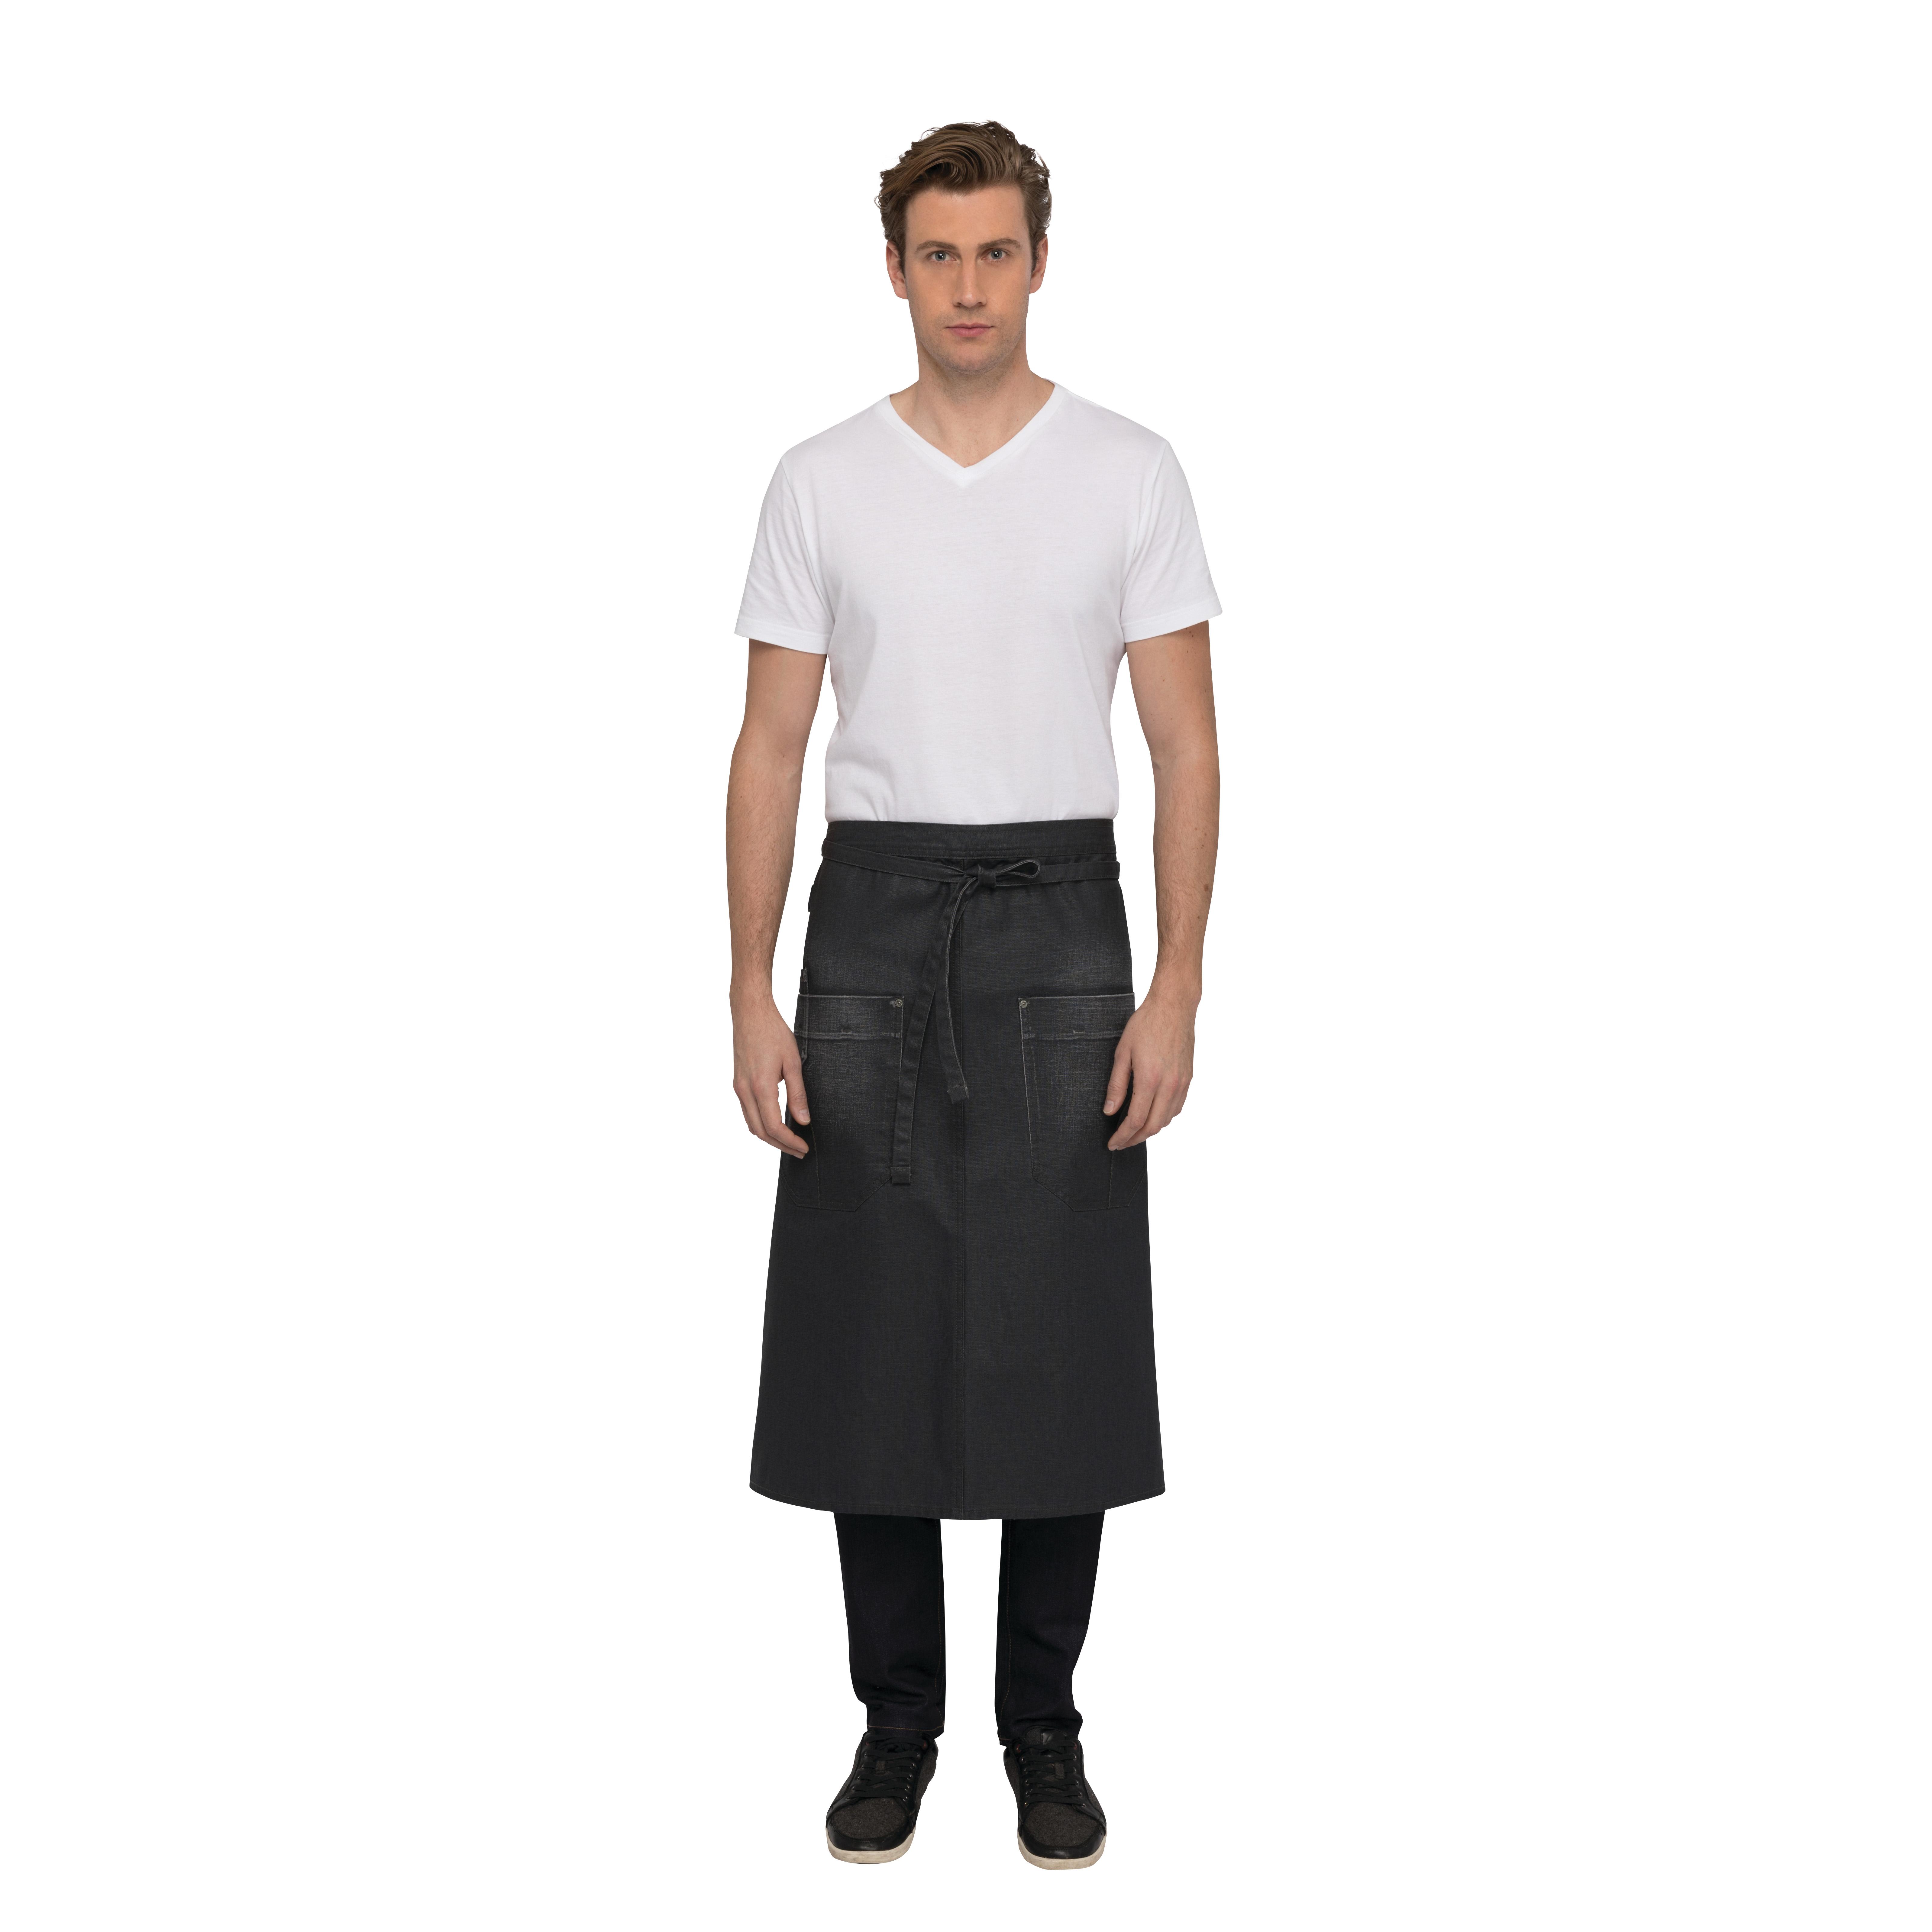 Chef Works AIN01GRY0 waist apron